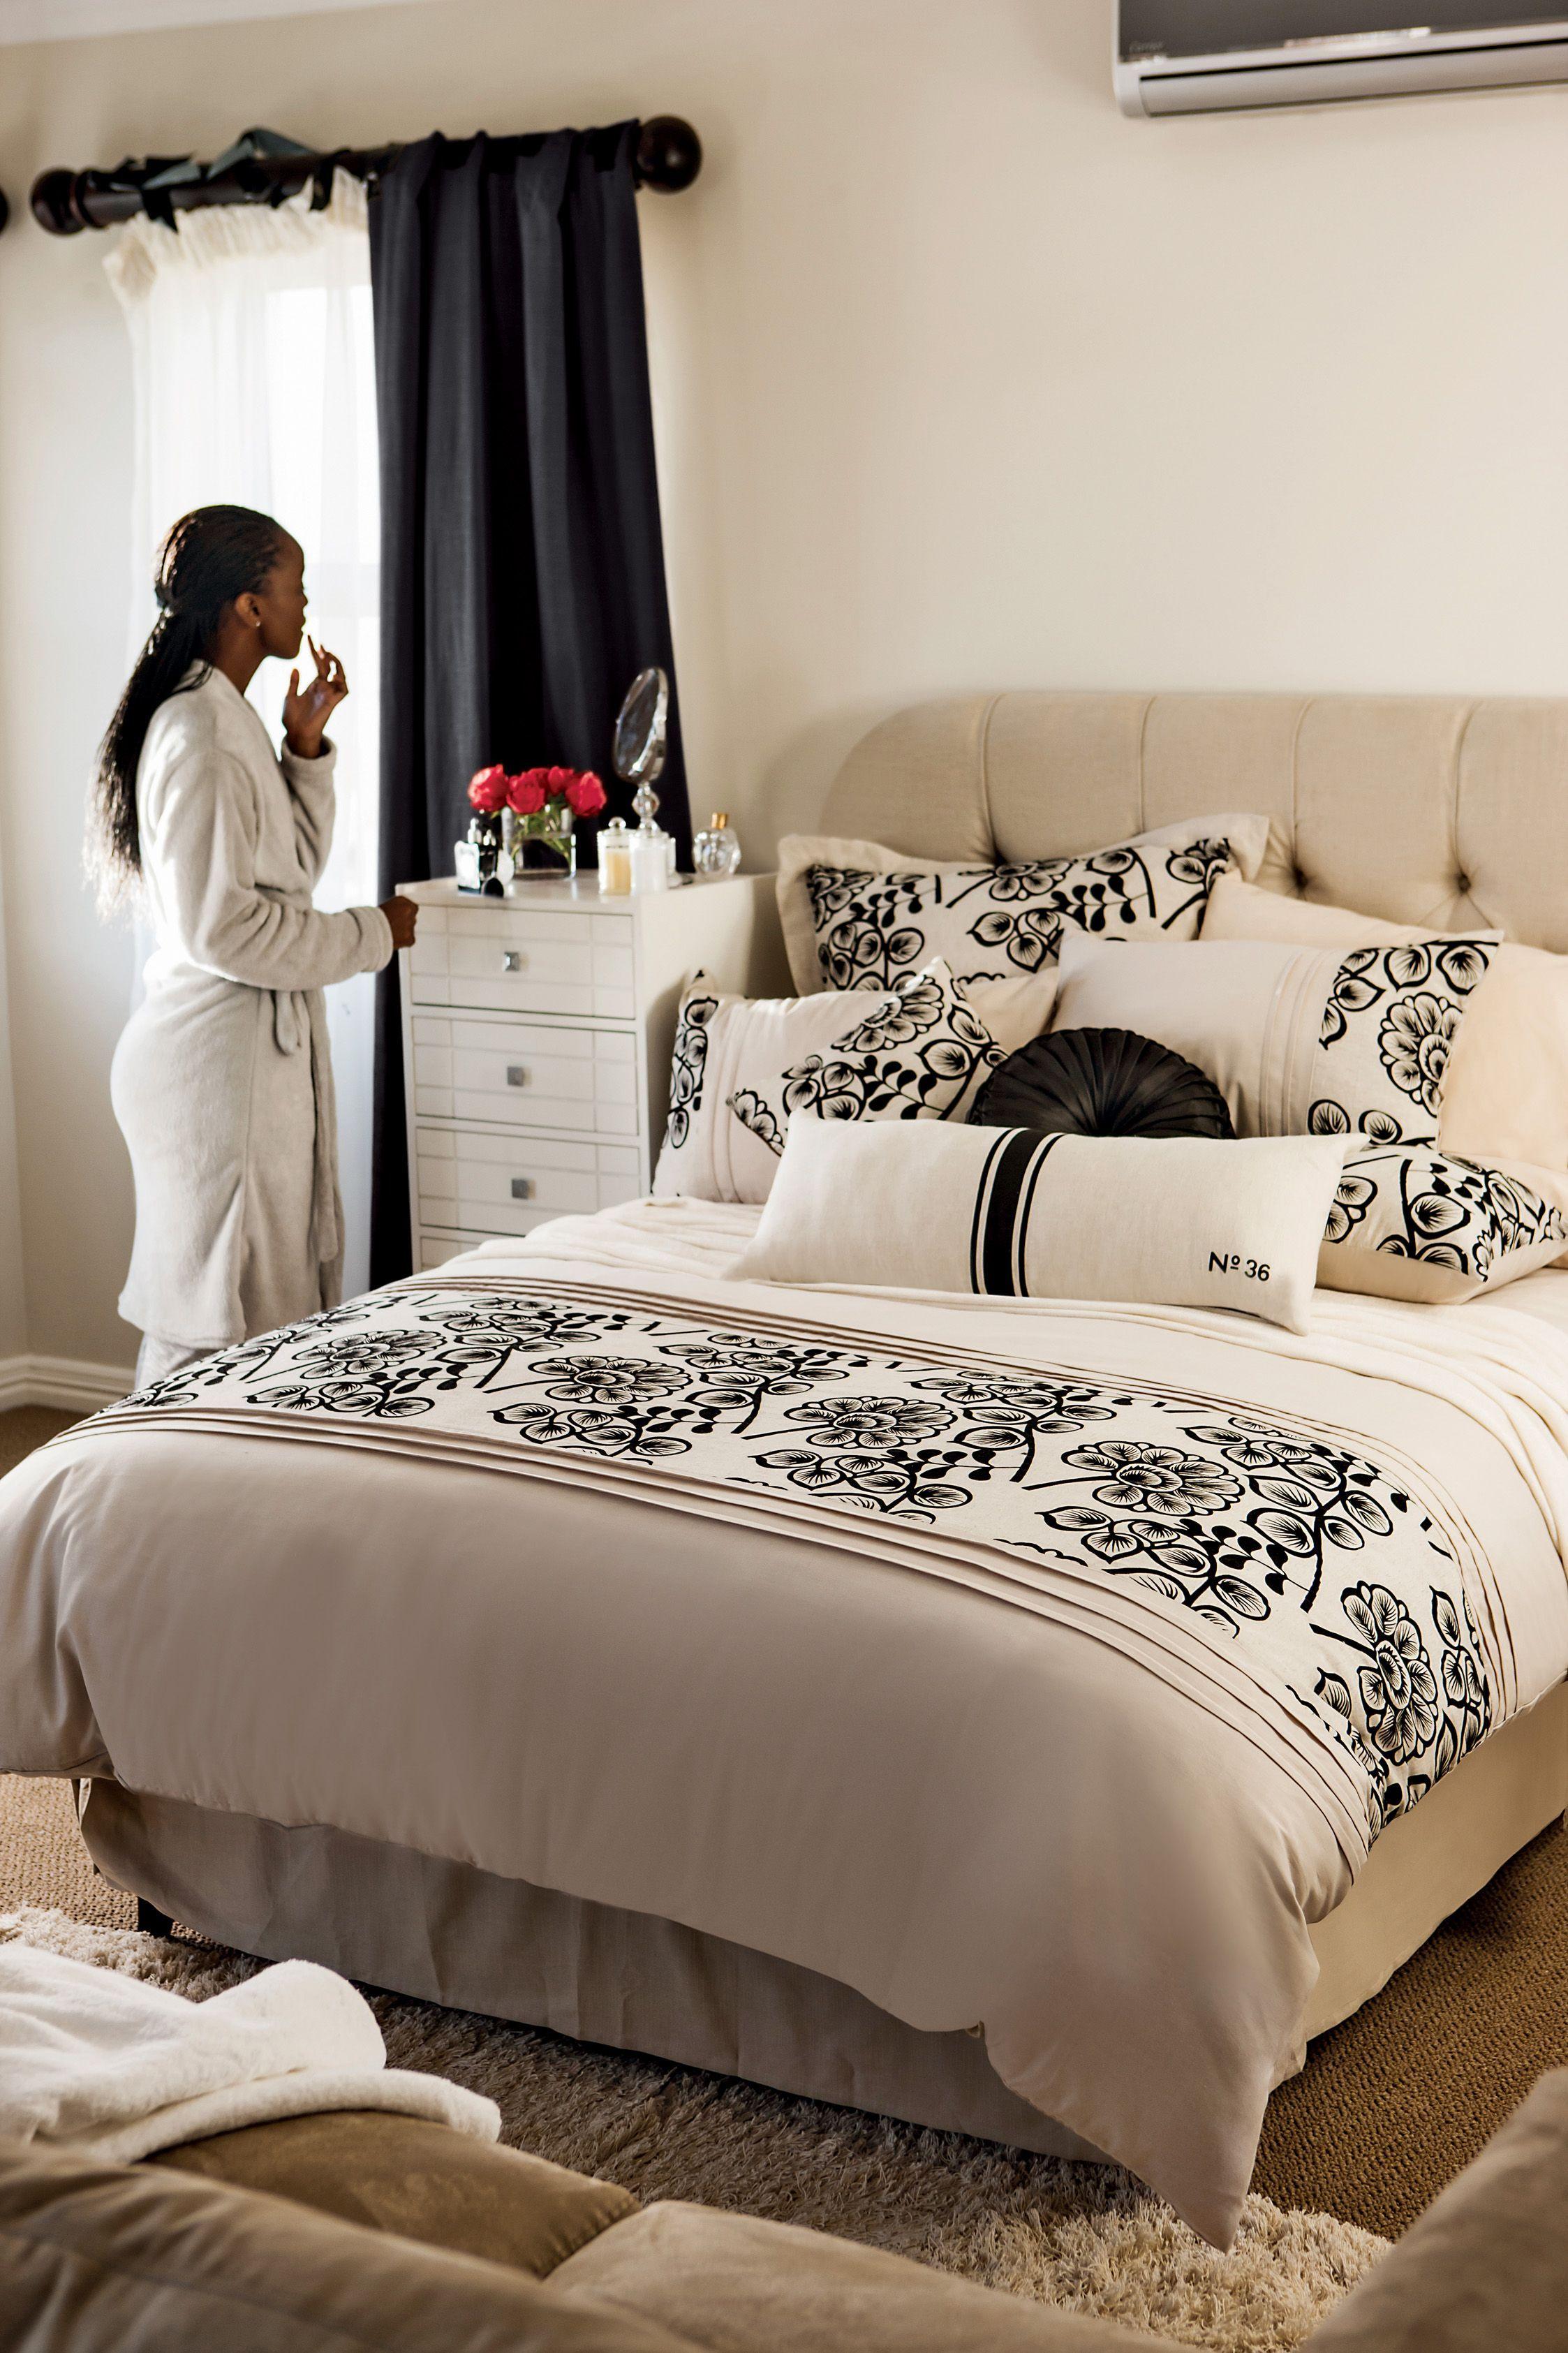 Mr Price Home Bedroom Decor